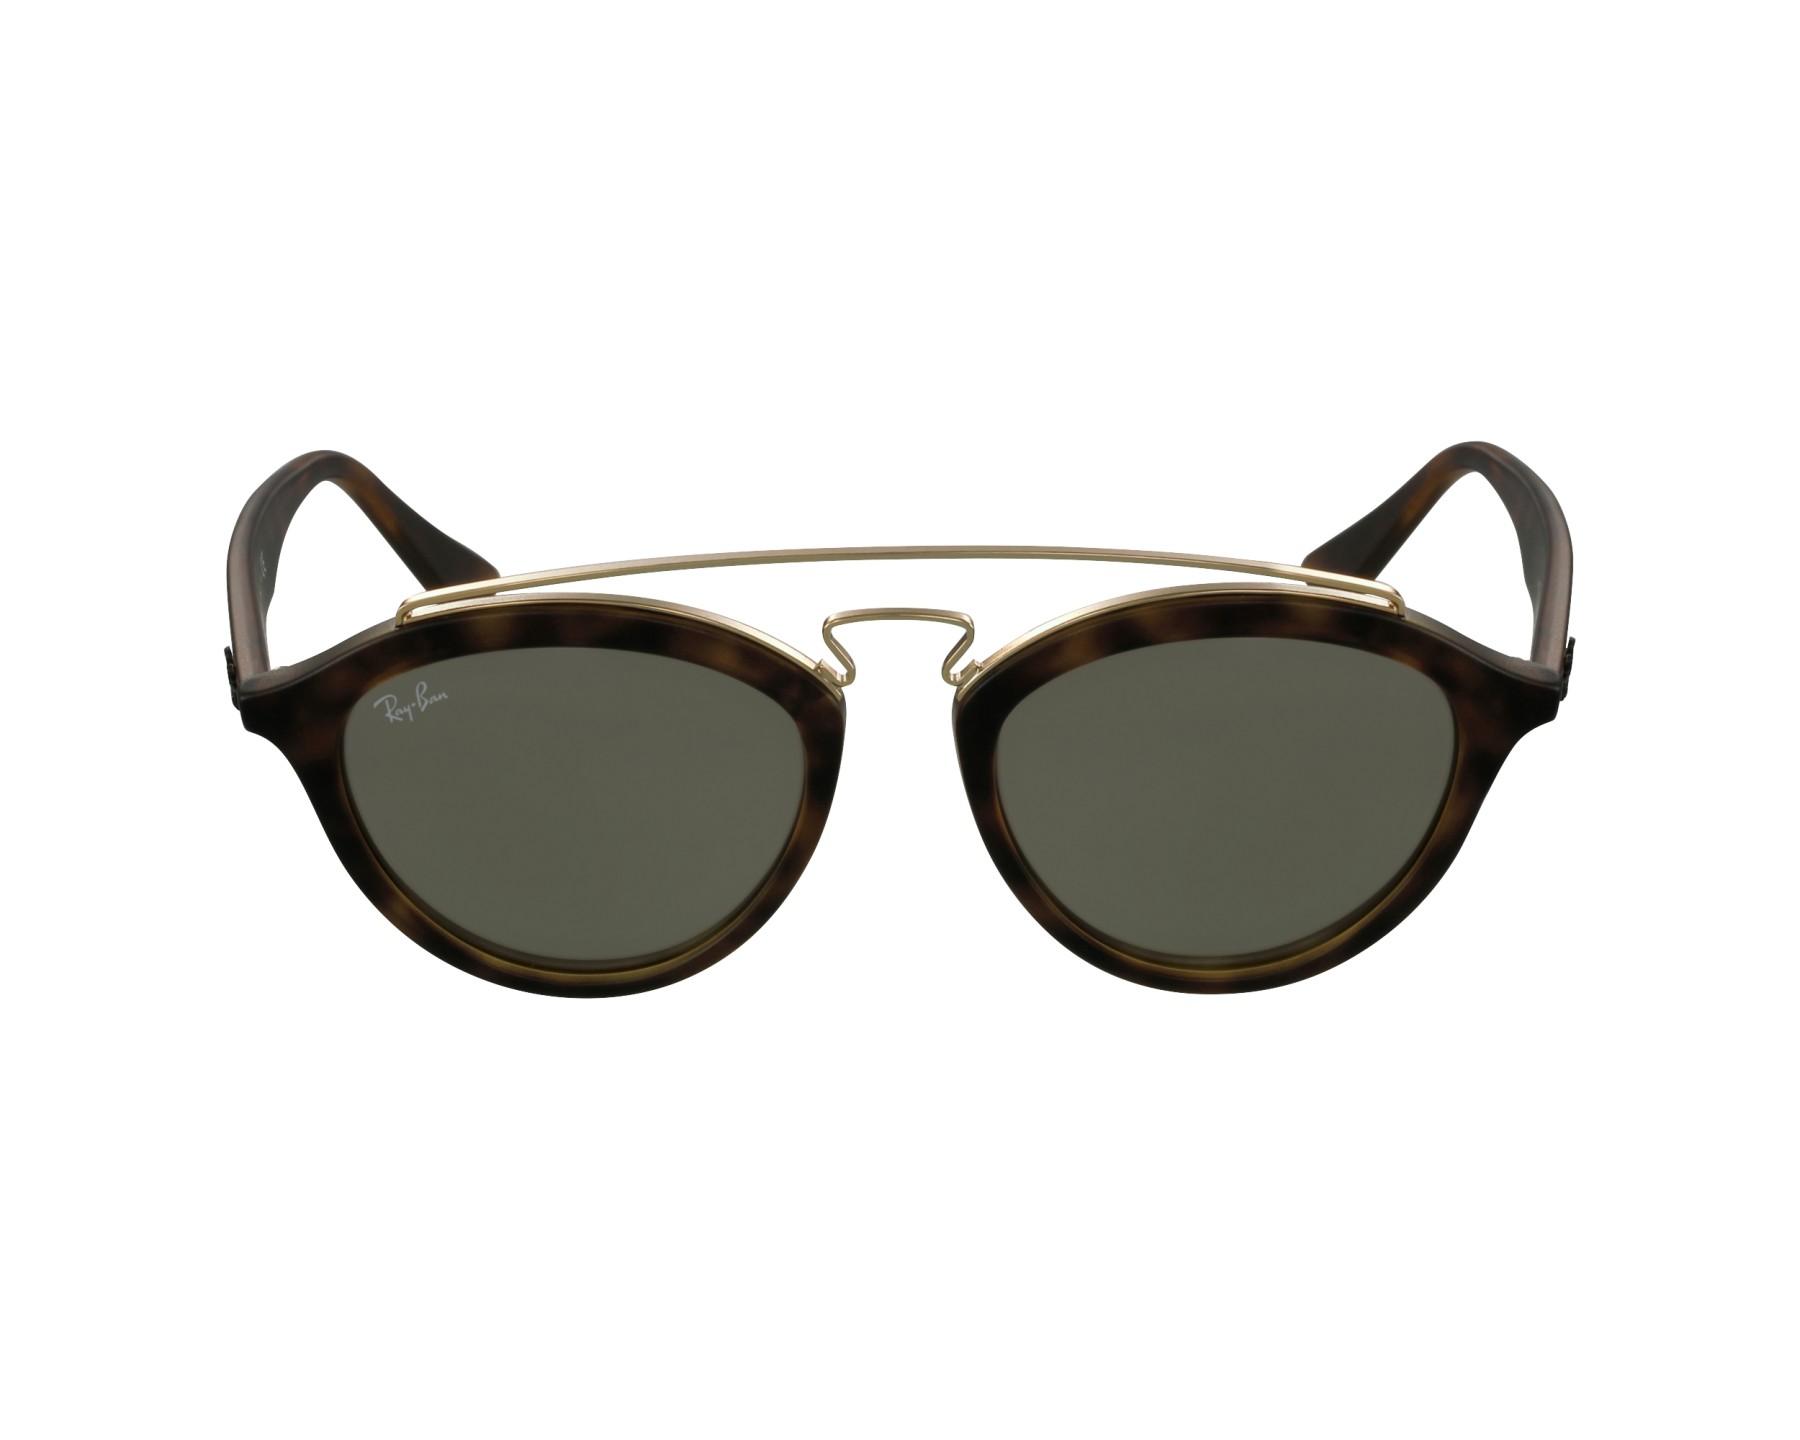 e622fda741 Sunglasses Ray-Ban RB-4257 6092 5A 53-19 Havana Gold profile